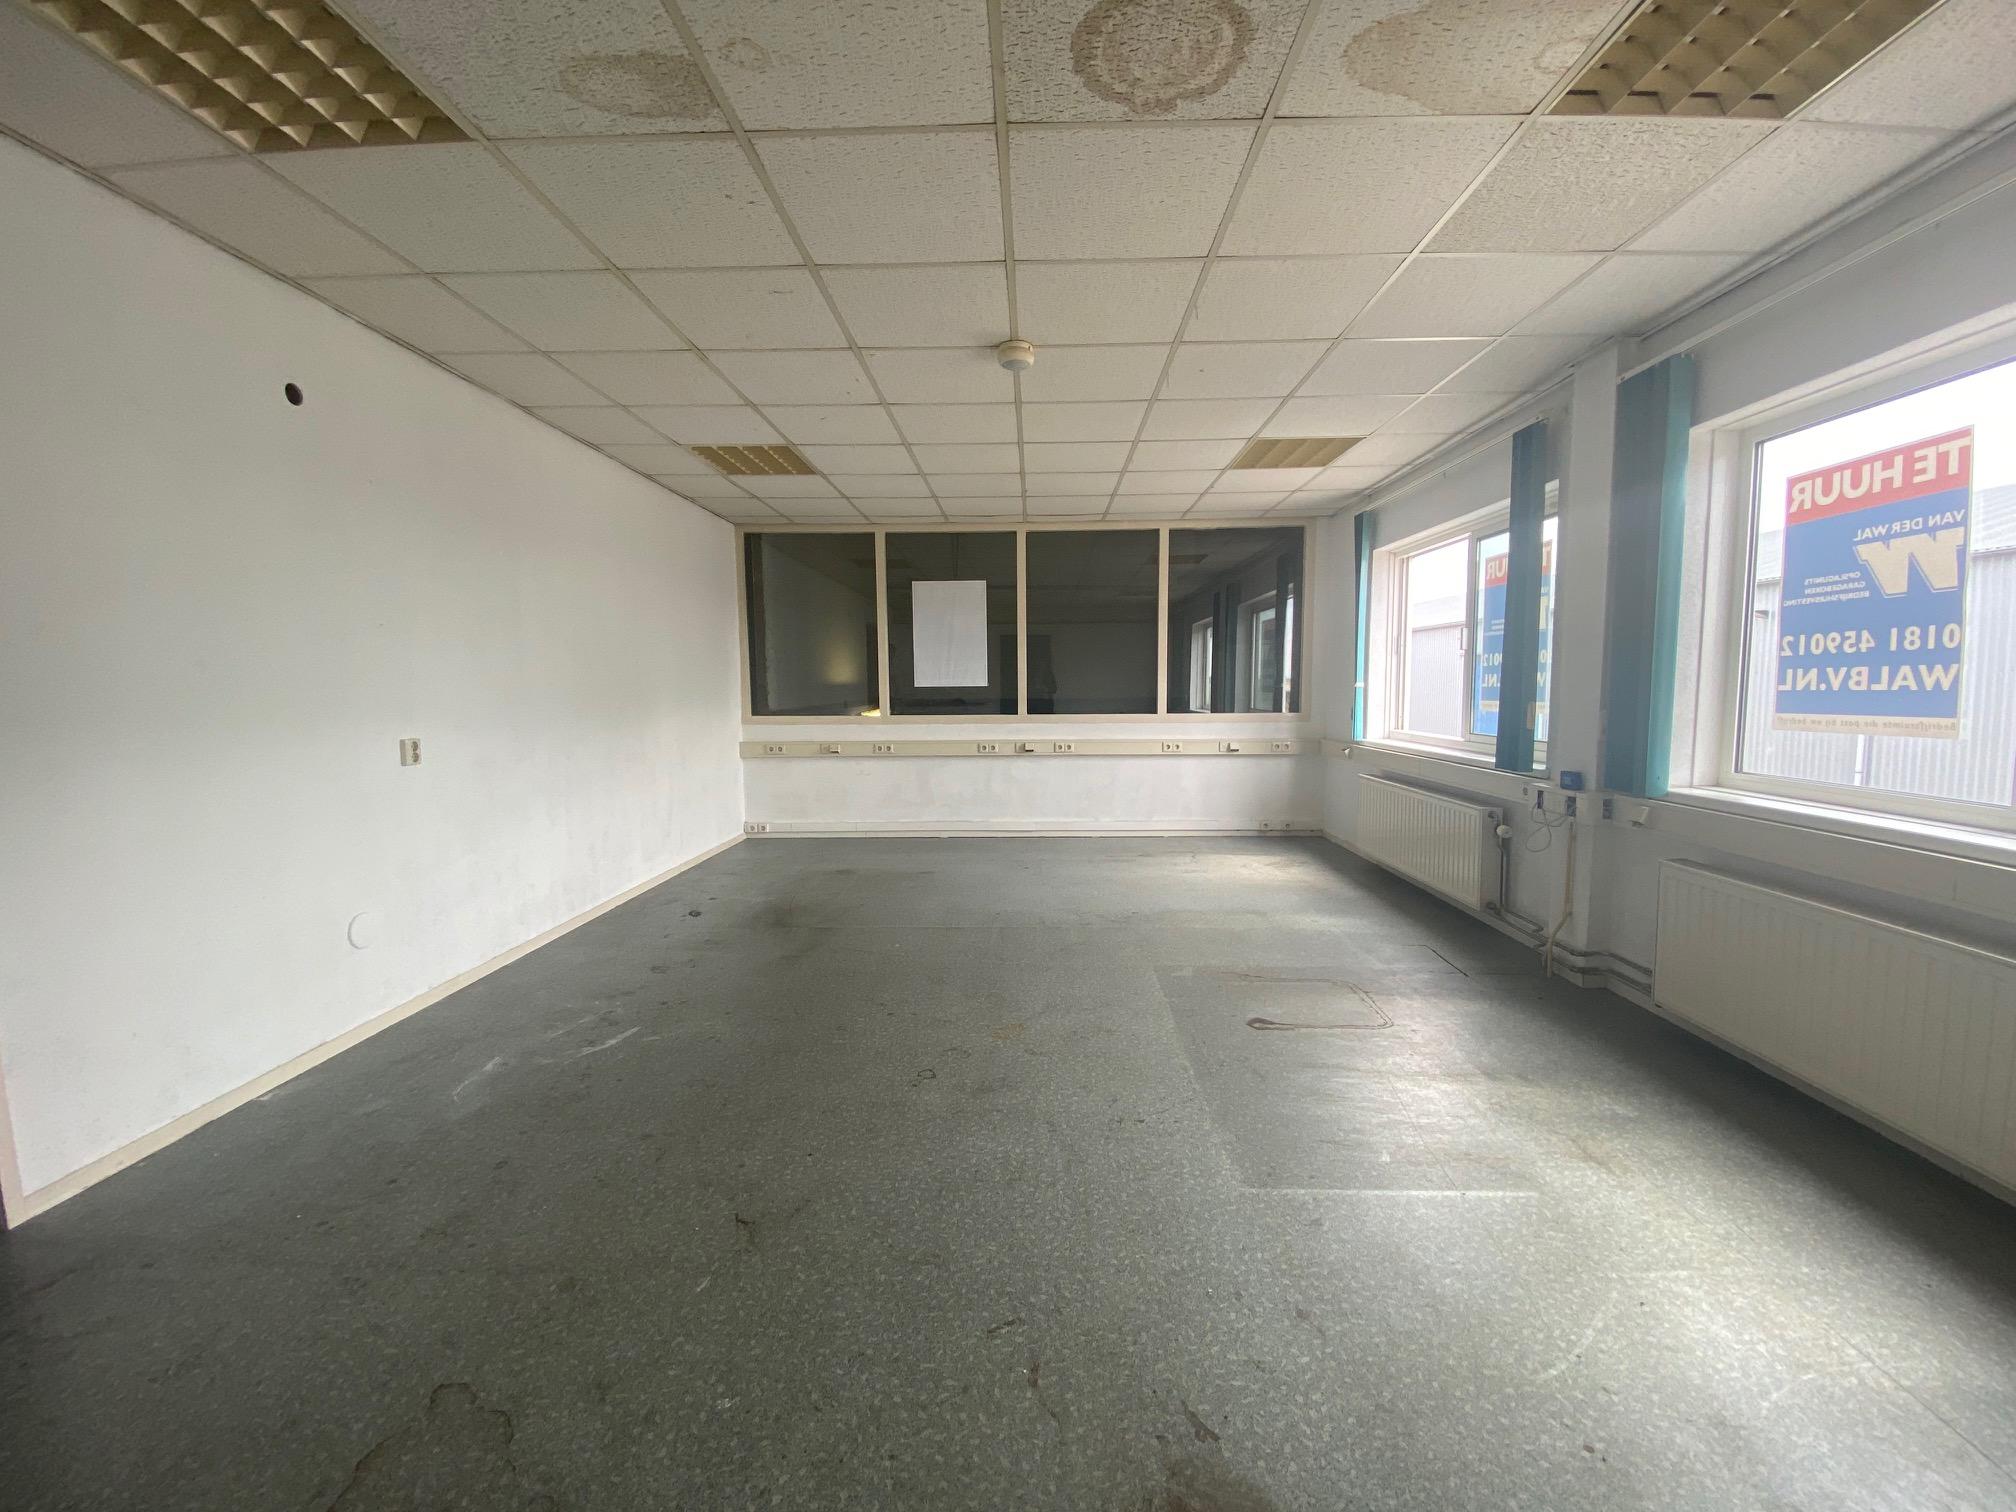 Kerkweg 15P8 kantoorruimte